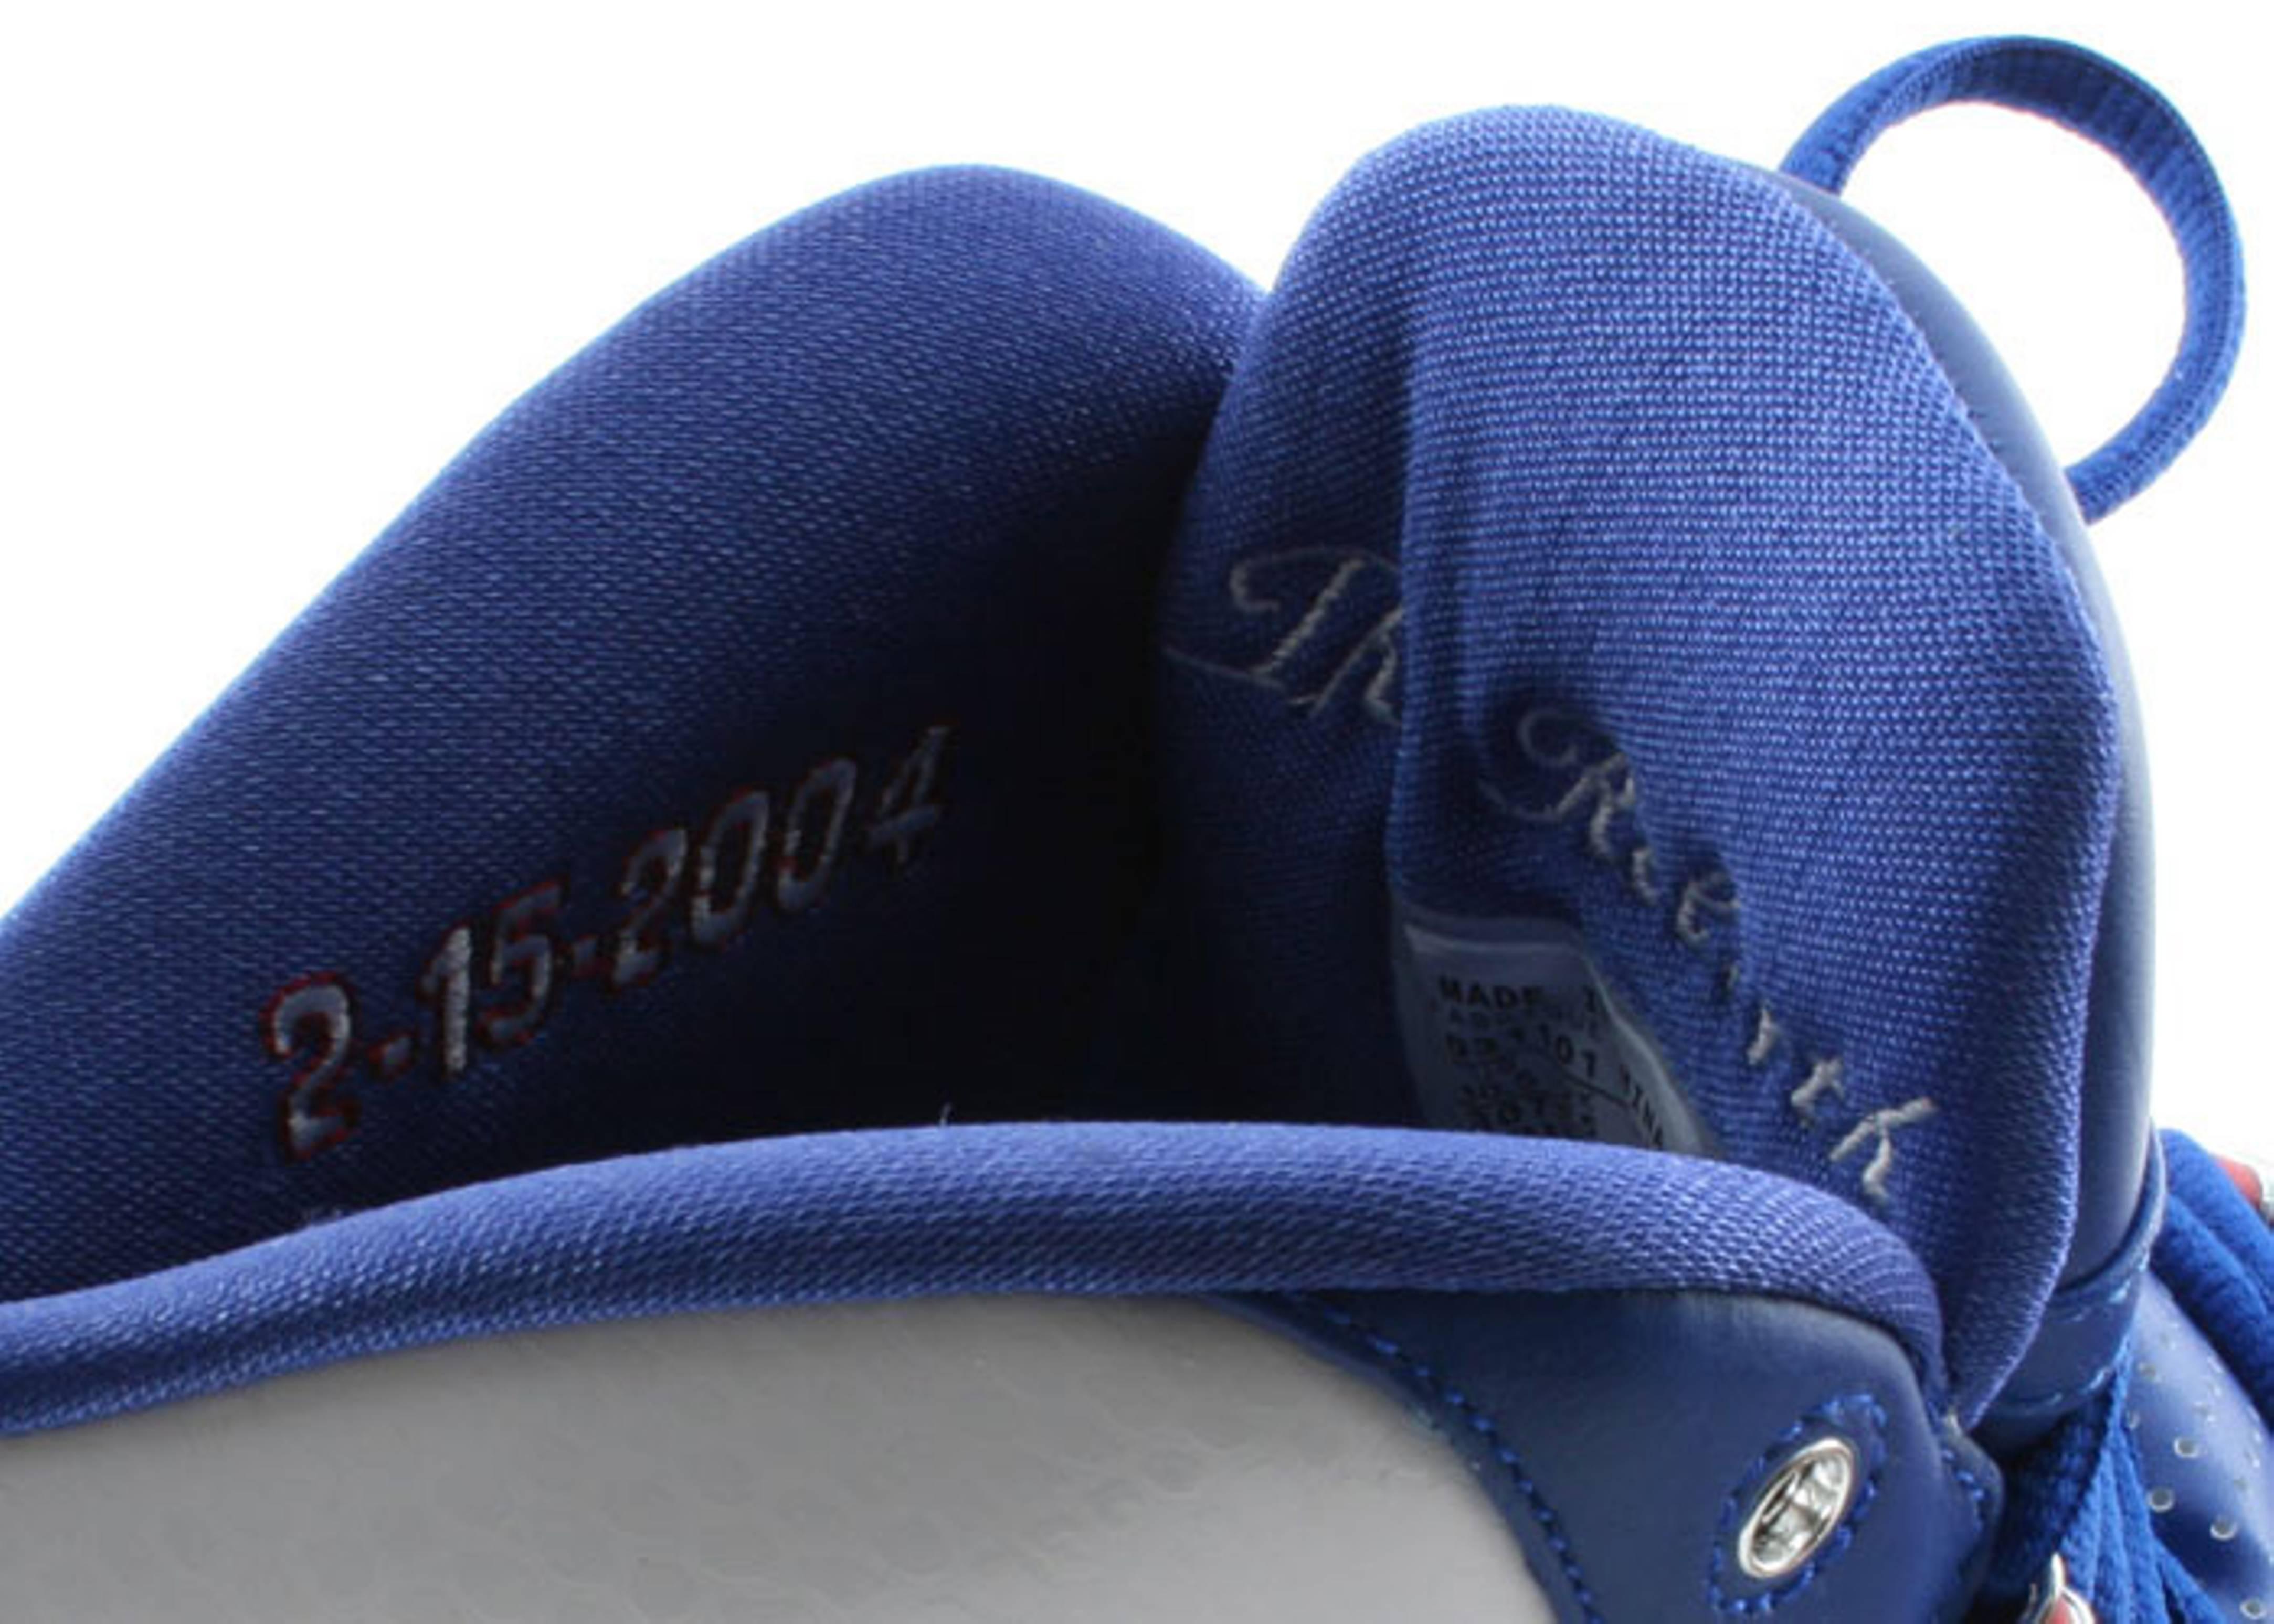 sports shoes a14ca a32b3 shox vc 3 - varsity royalvarsity red-white (all star)  Flight Club